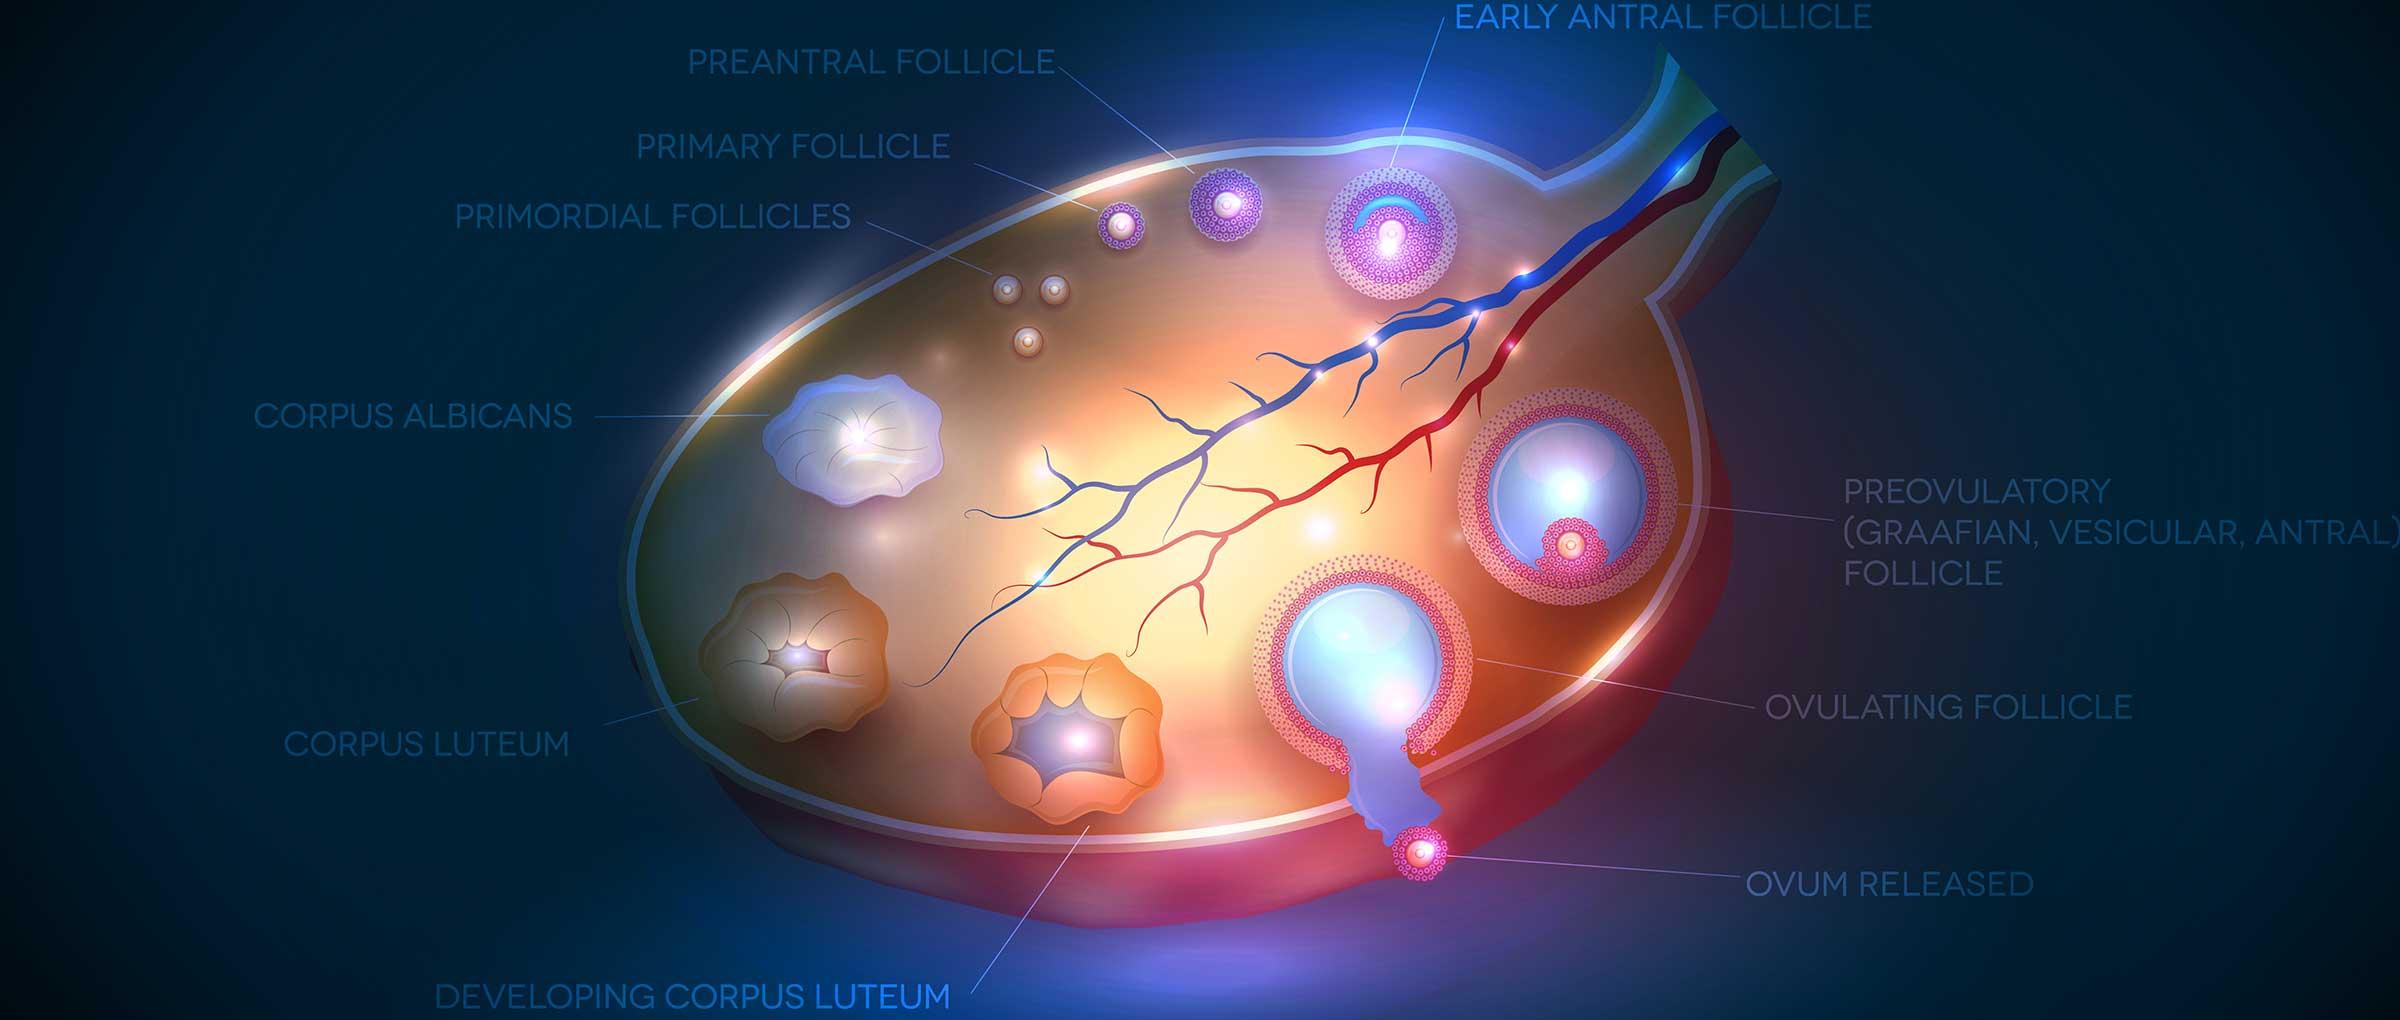 Follicle-stimulating hormone (FSH) function in females